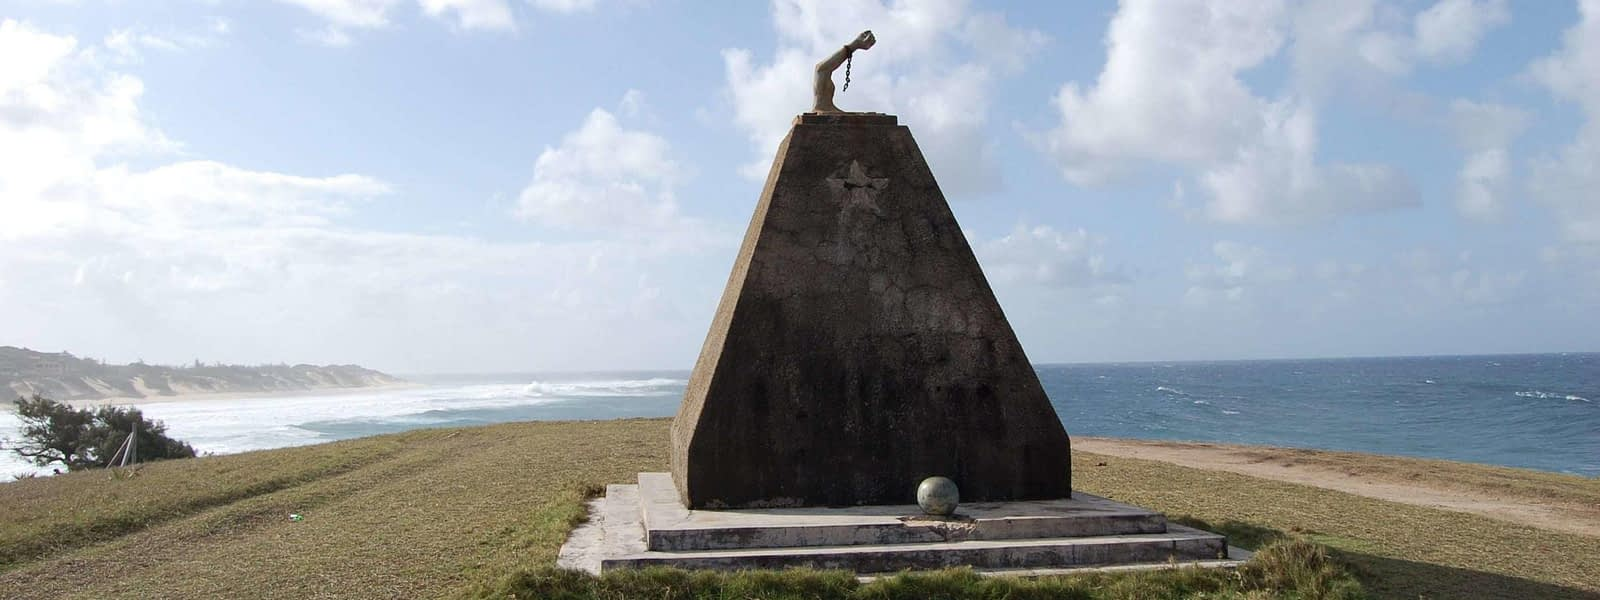 photo FRELIMO monument Tofinho Mozambique